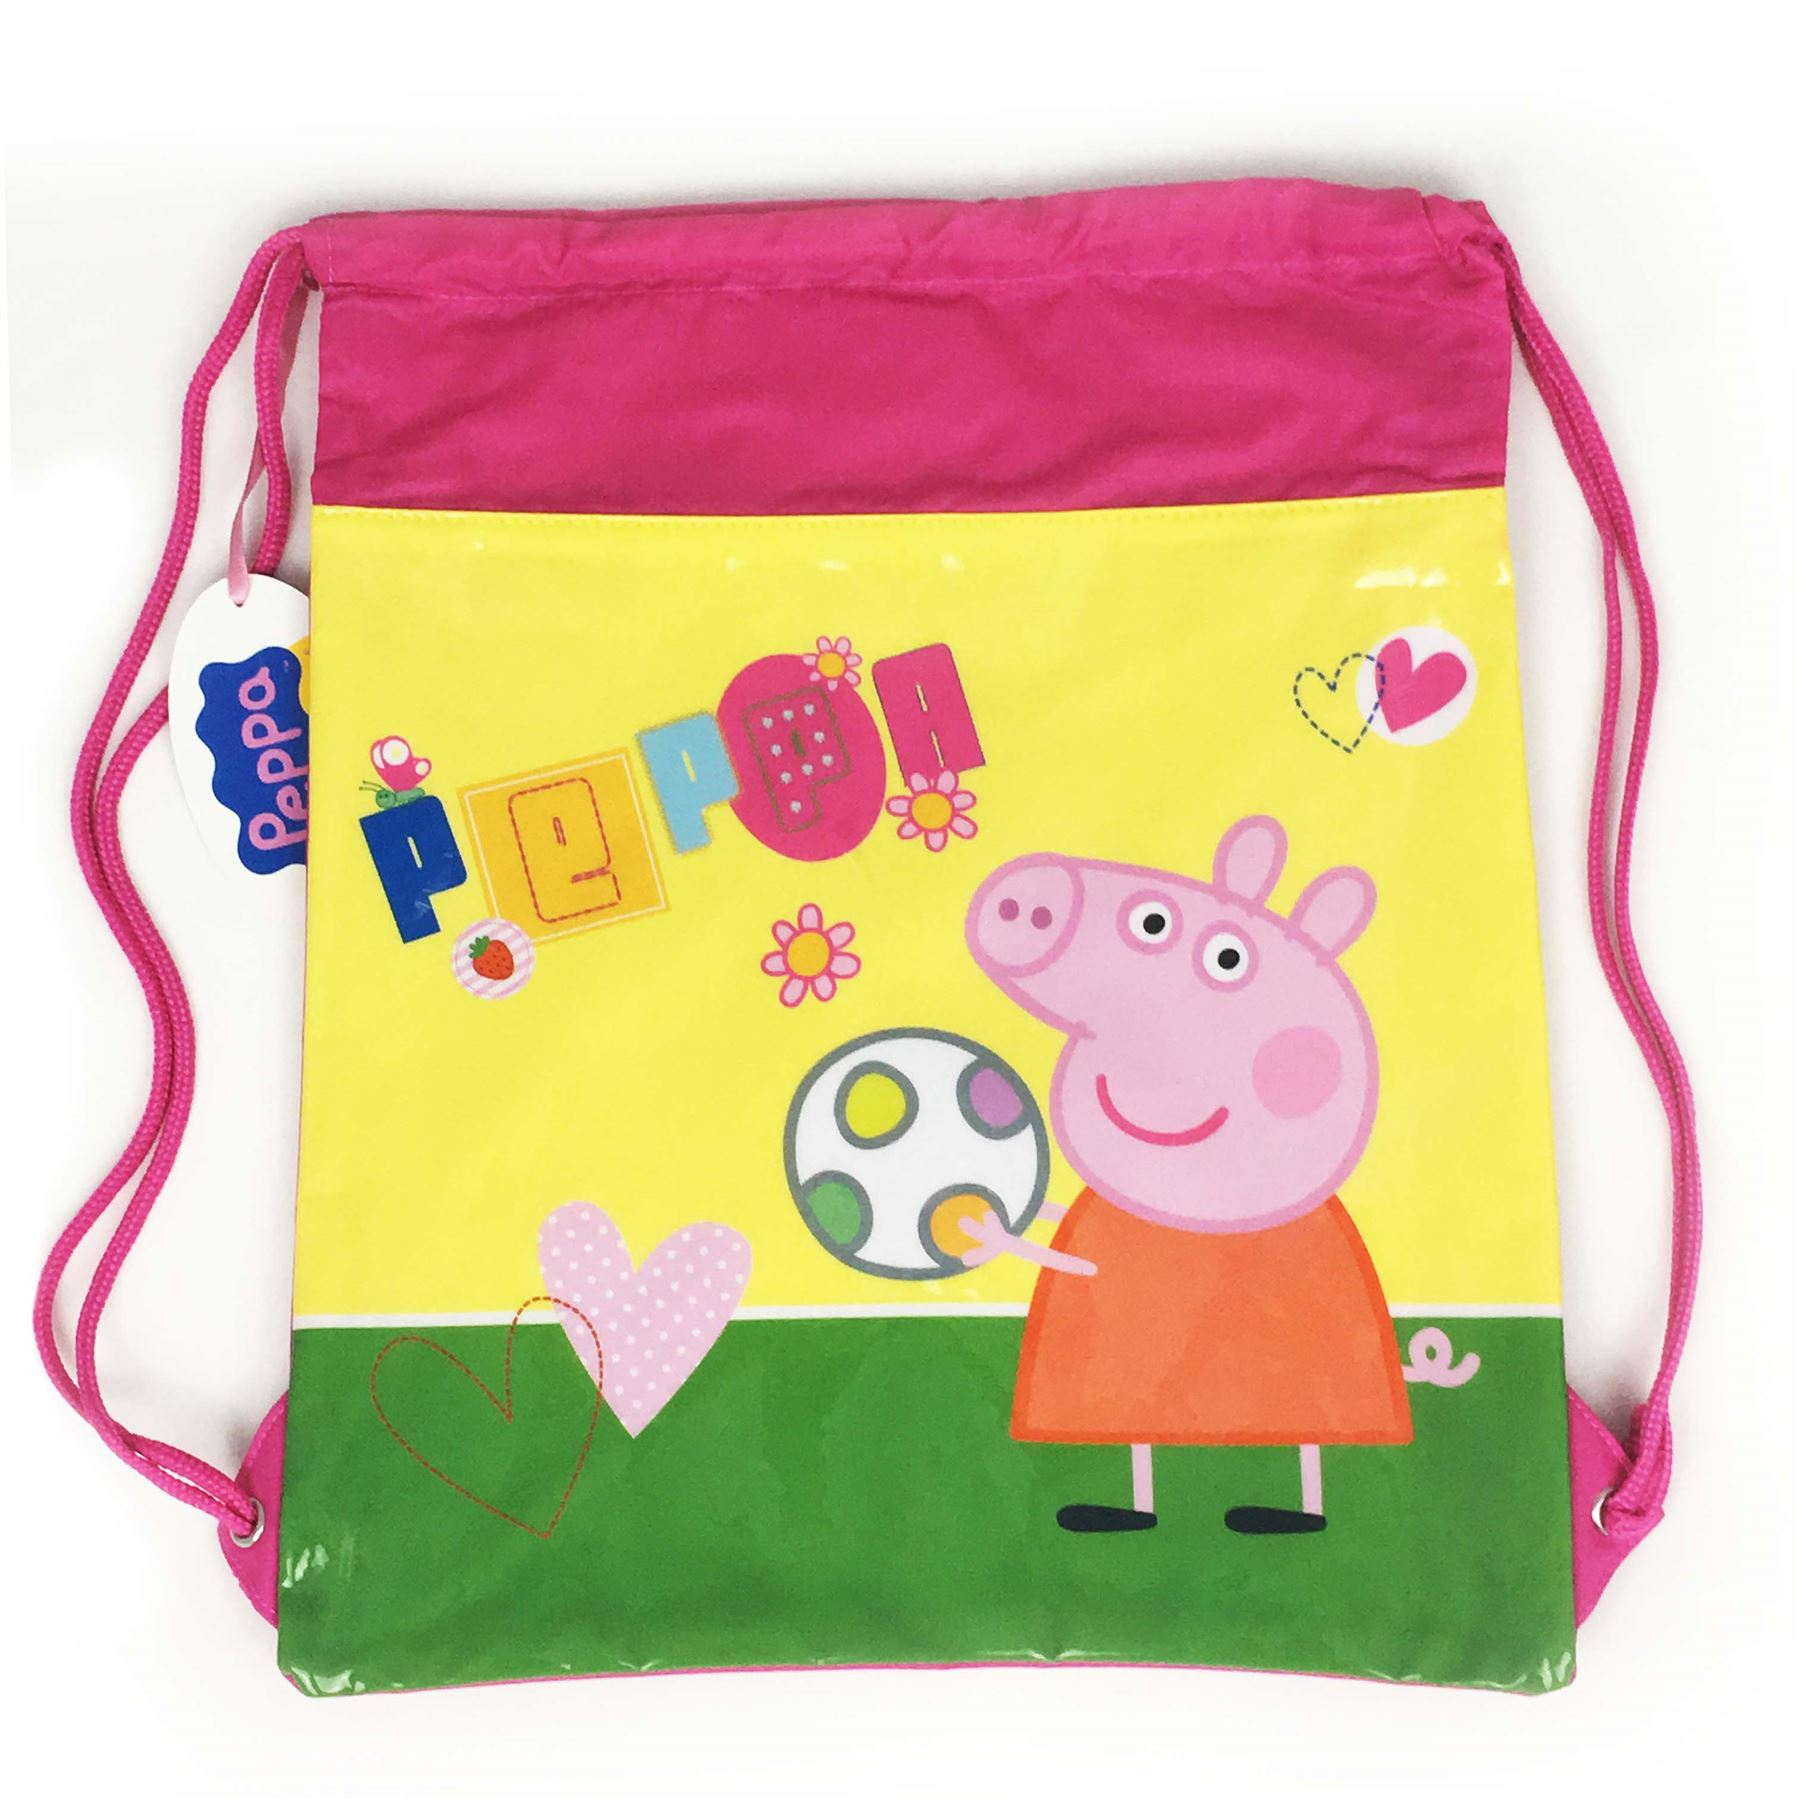 Peppa Pig George Pig Boys 3D Drawstring Gym Bag